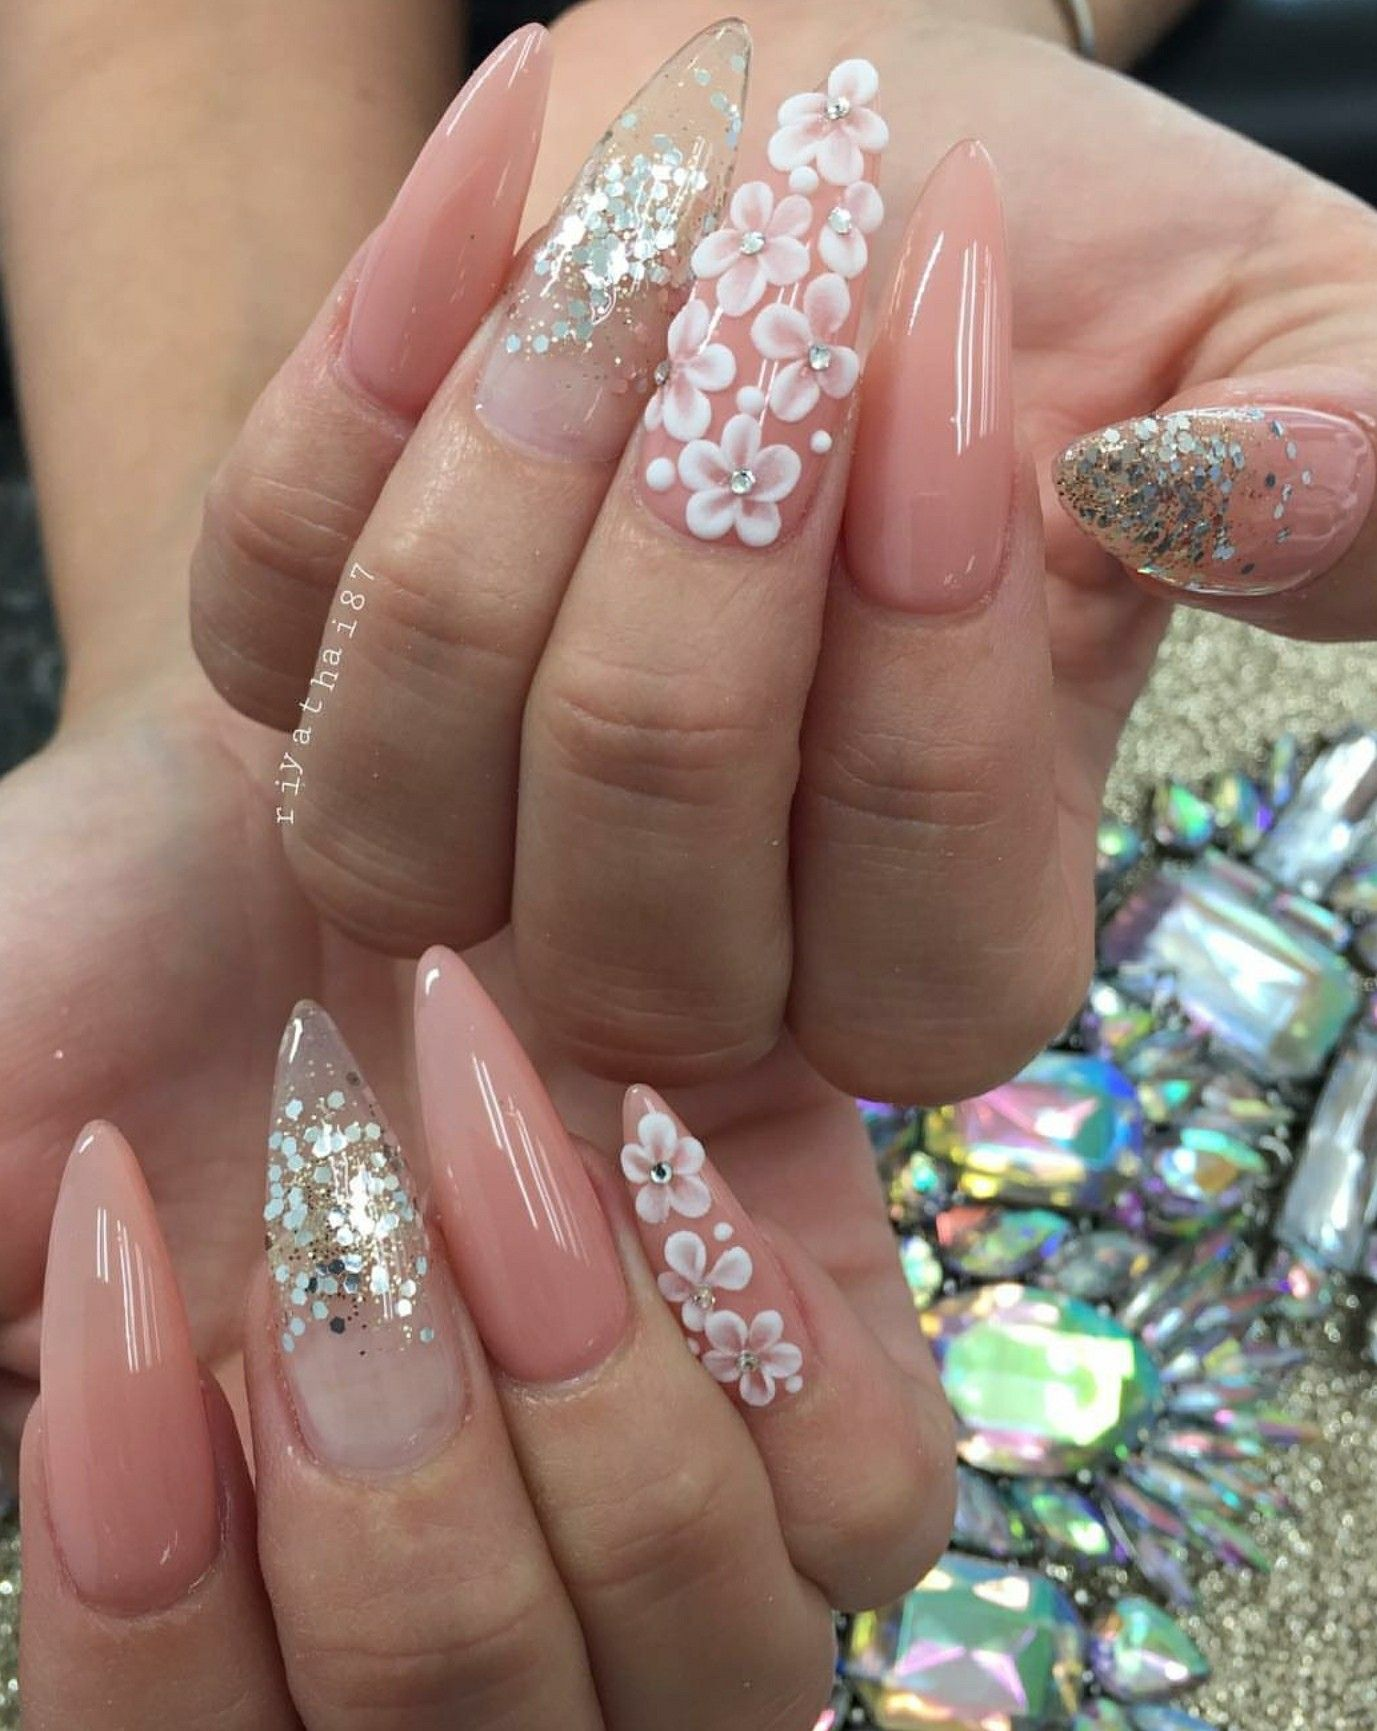 Stiletto Nails Peach Nails Glitter Nails 3d Art 3d Flowers